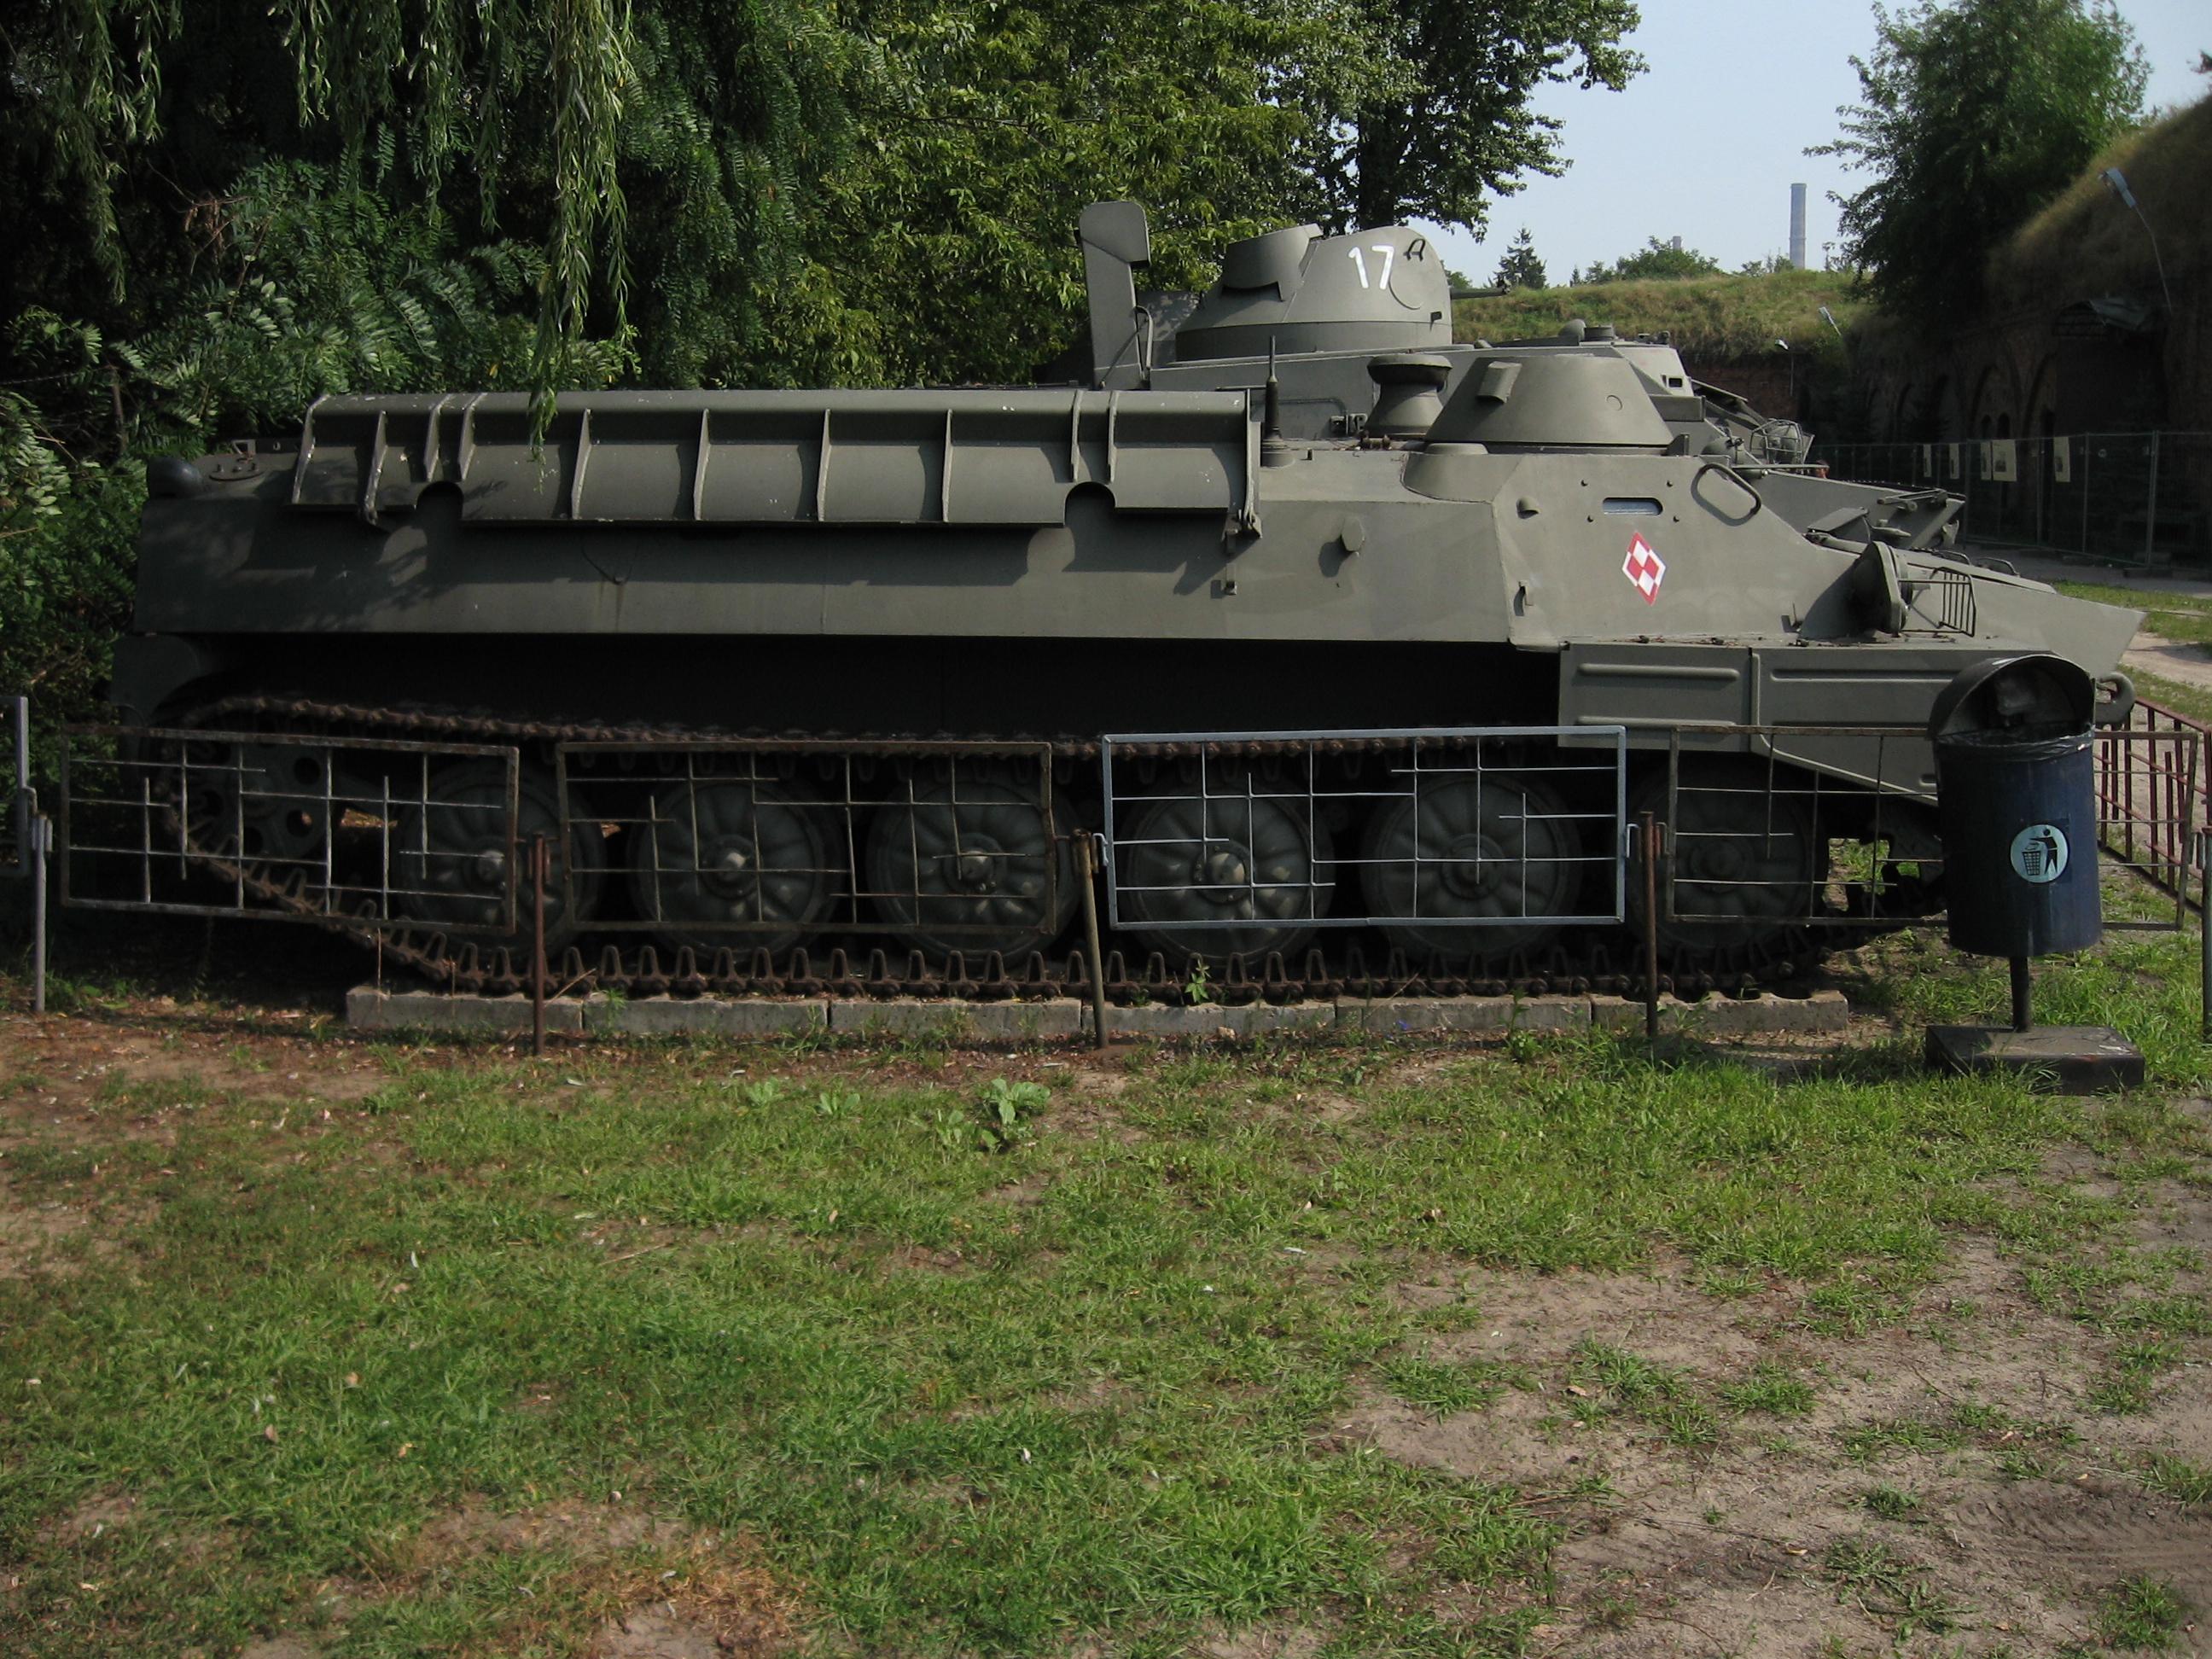 https://upload.wikimedia.org/wikipedia/commons/7/78/MT-LB_armored_personnel_carrier_at_the_Muzeum_Polskiej_Techniki_Wojskowej_in_Warsaw.jpg